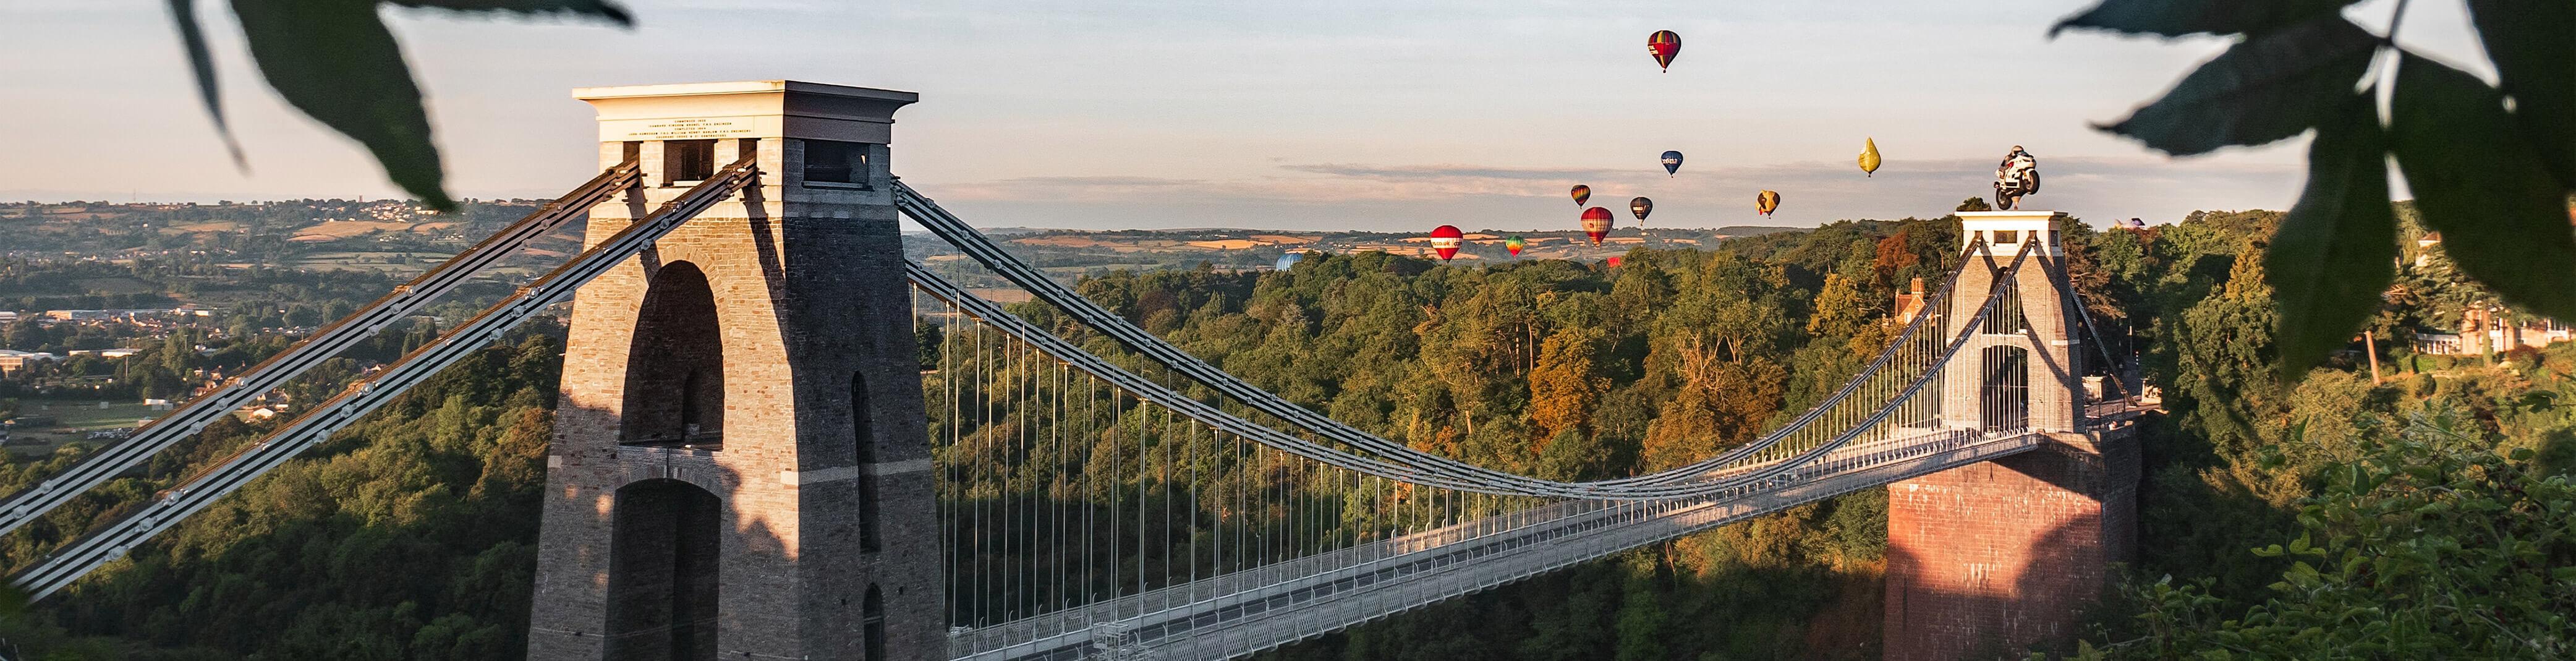 Online Training Courses In Bristol